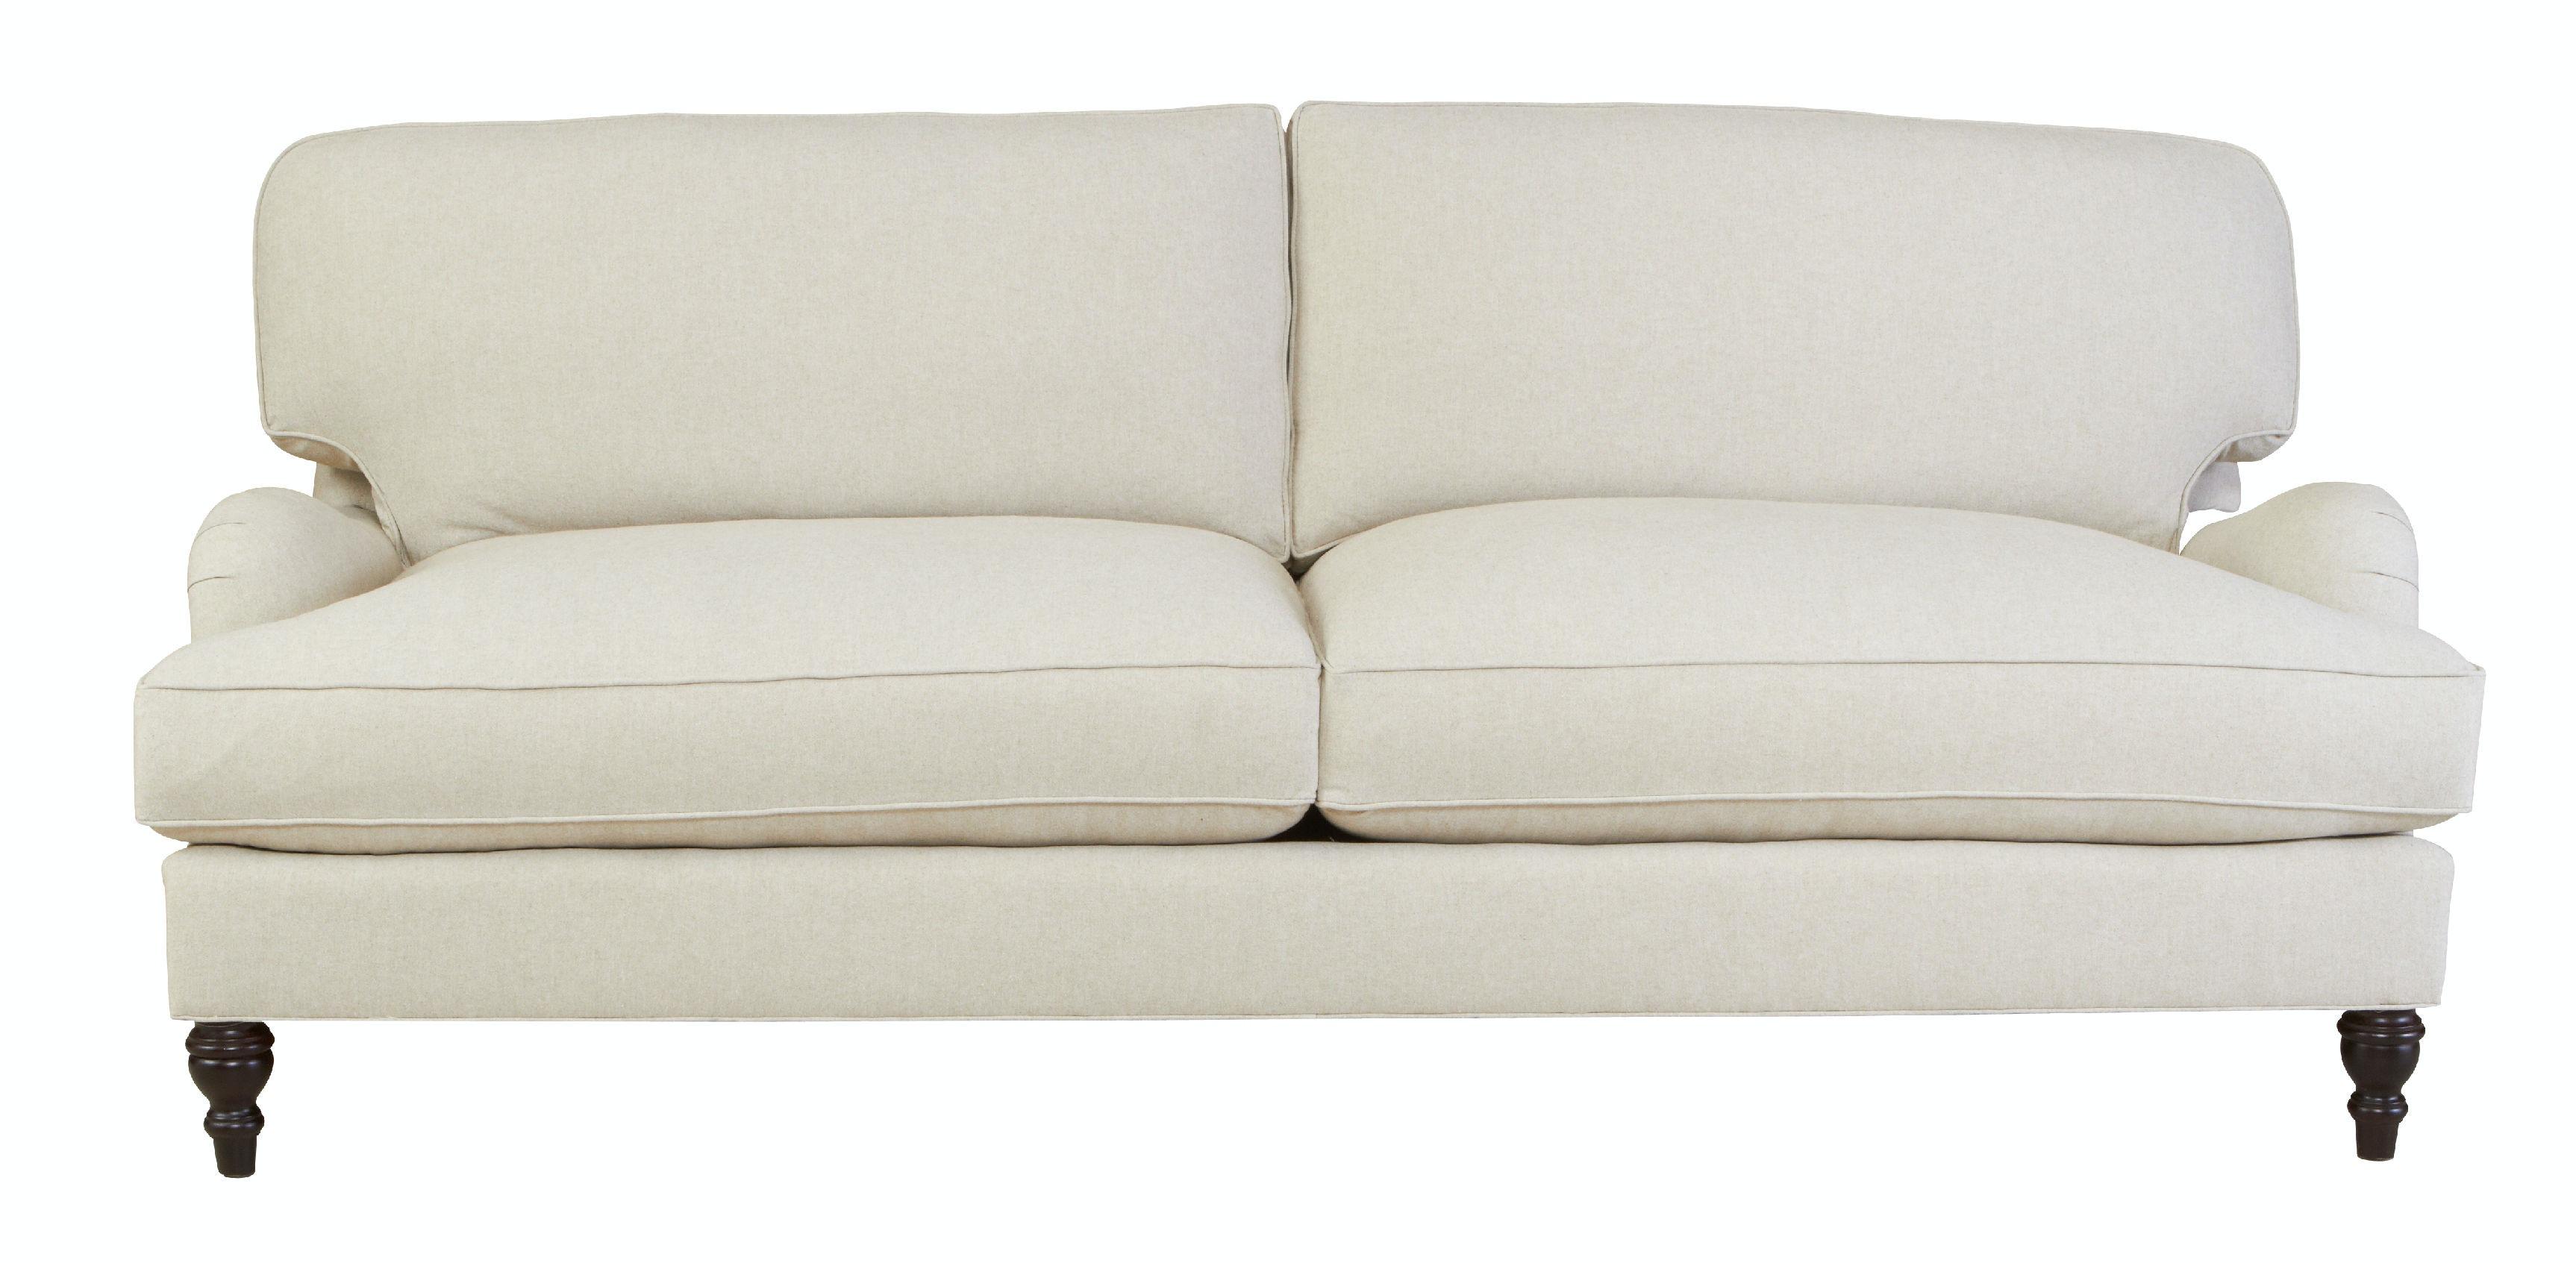 Southern Furniture Living Room Tate Sofa 24951 Hickory Furniture